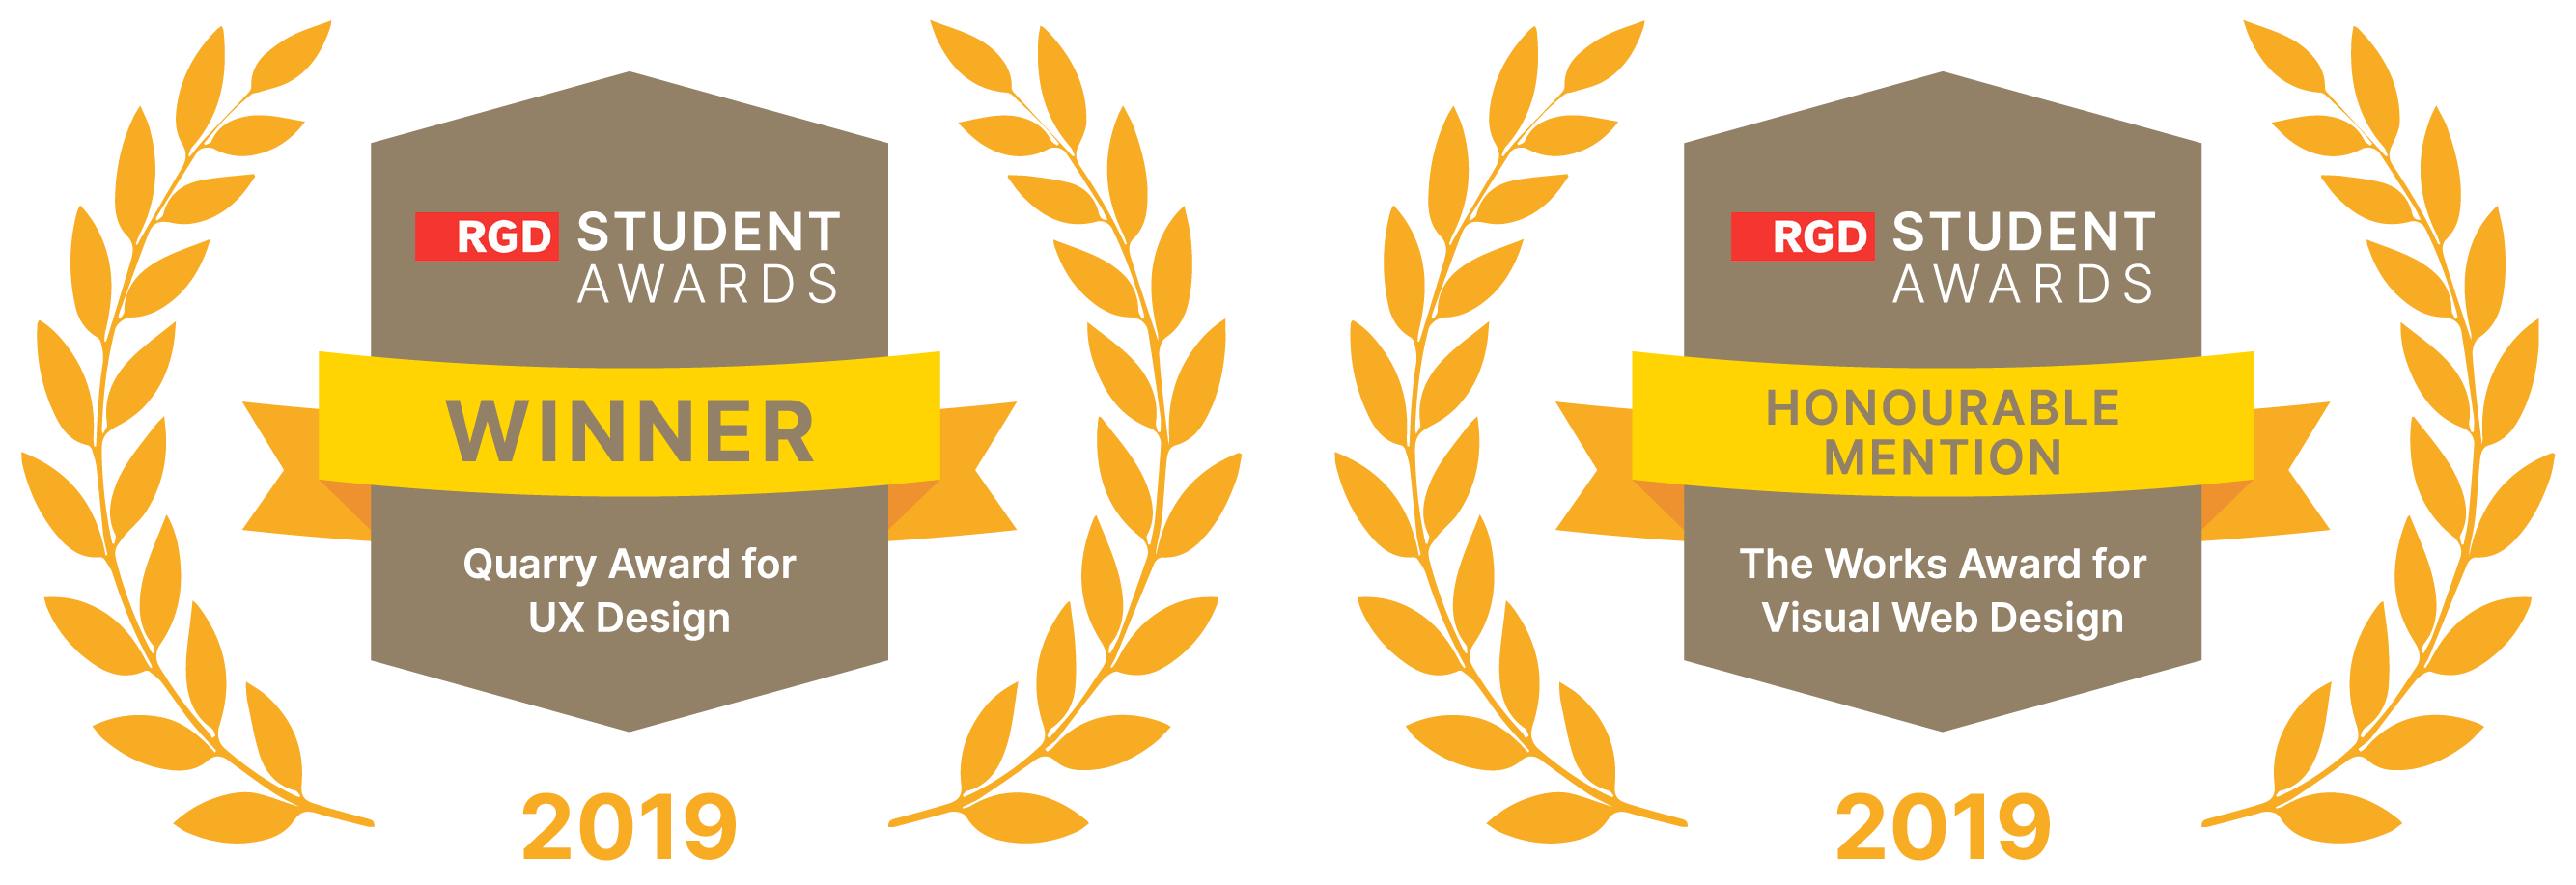 Award-Badges-Wynn_Awards